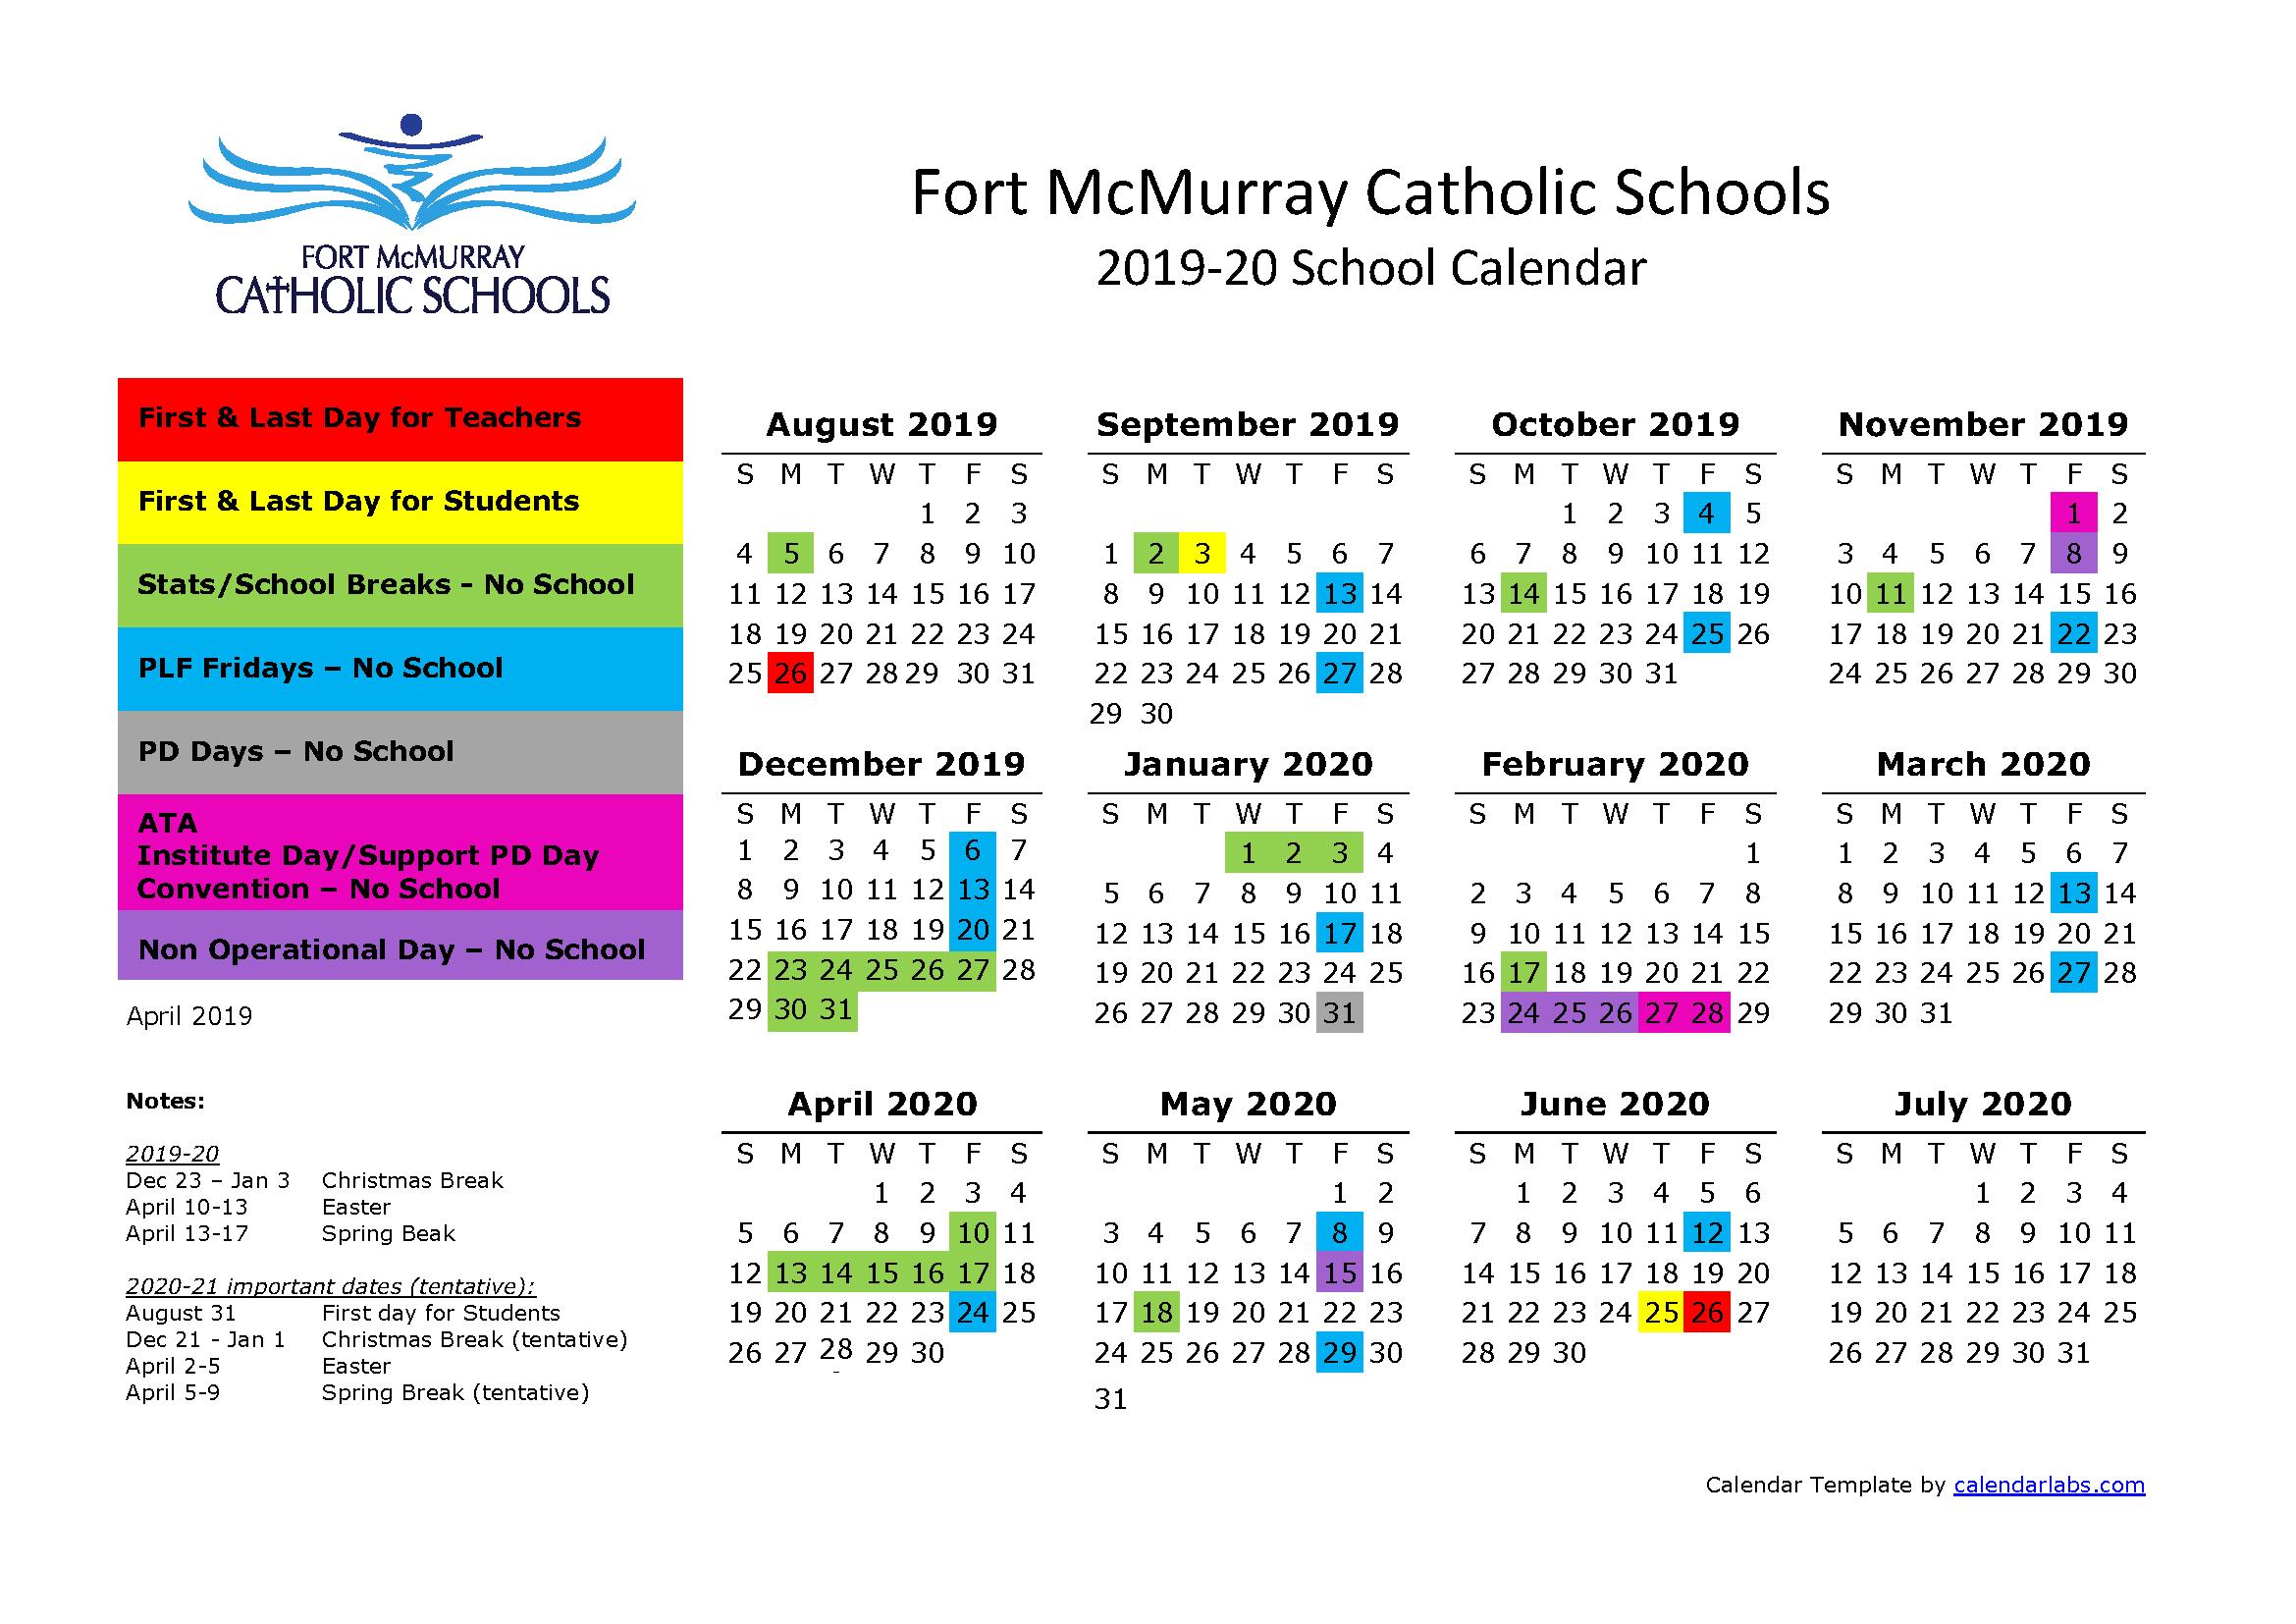 2020 2020 Calendar.School Calendar 2019 2020 Father Mercredi School